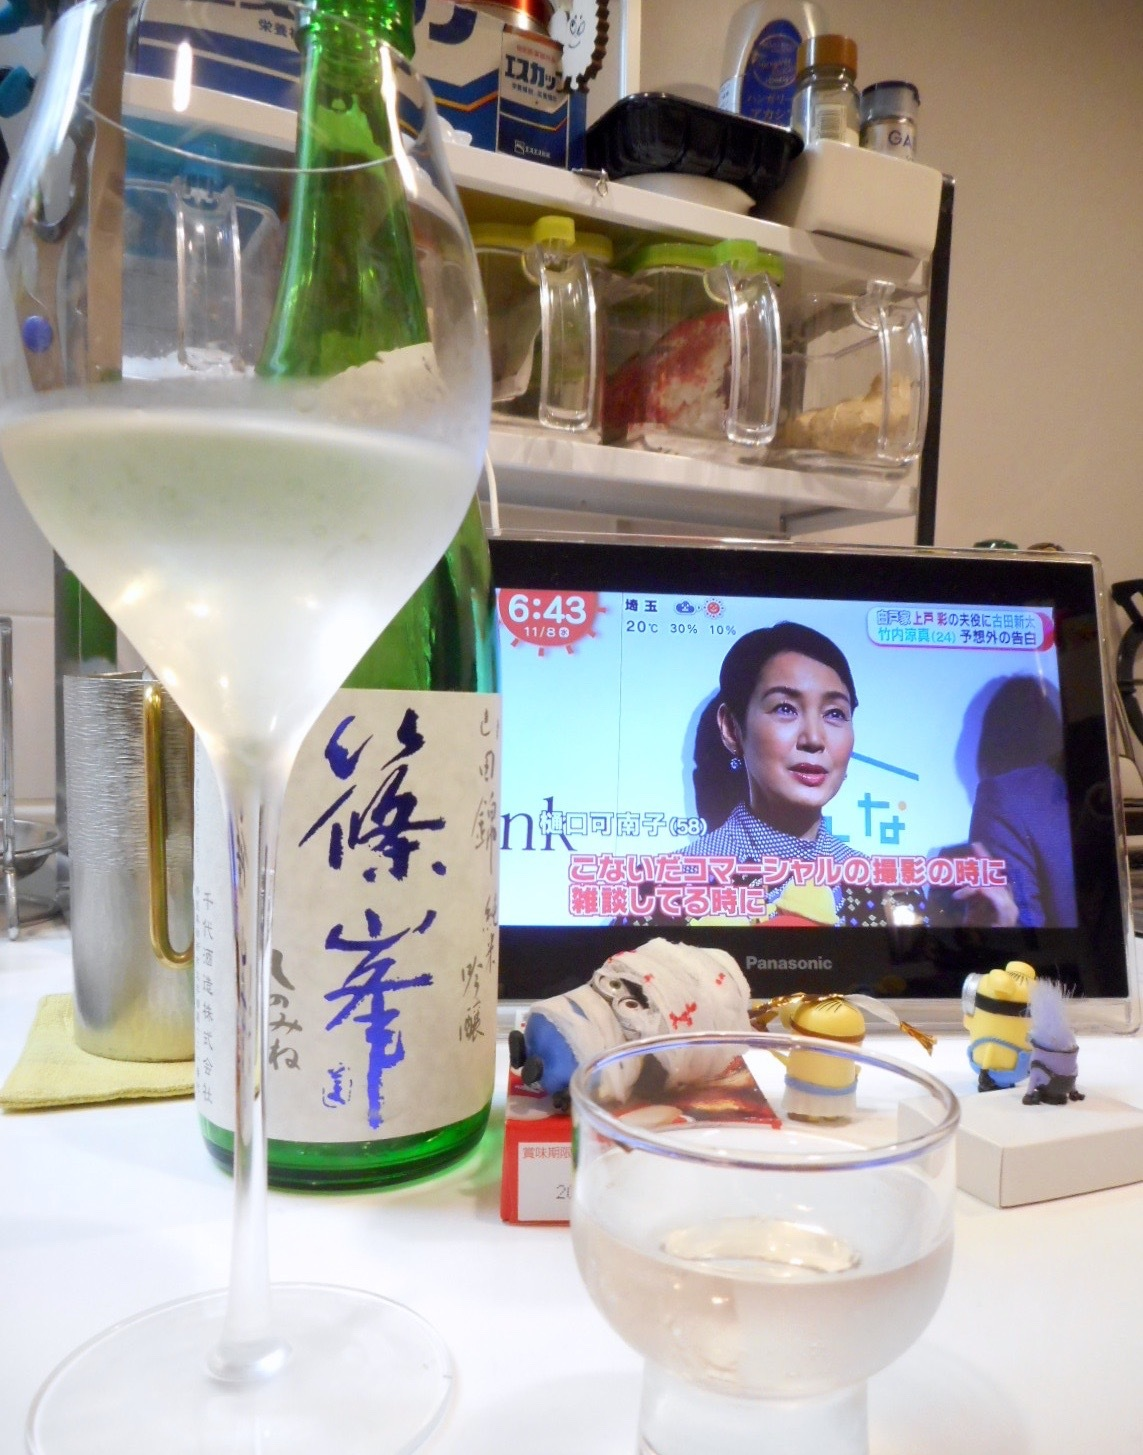 shinomine_sou_natsuiro28by12.jpg